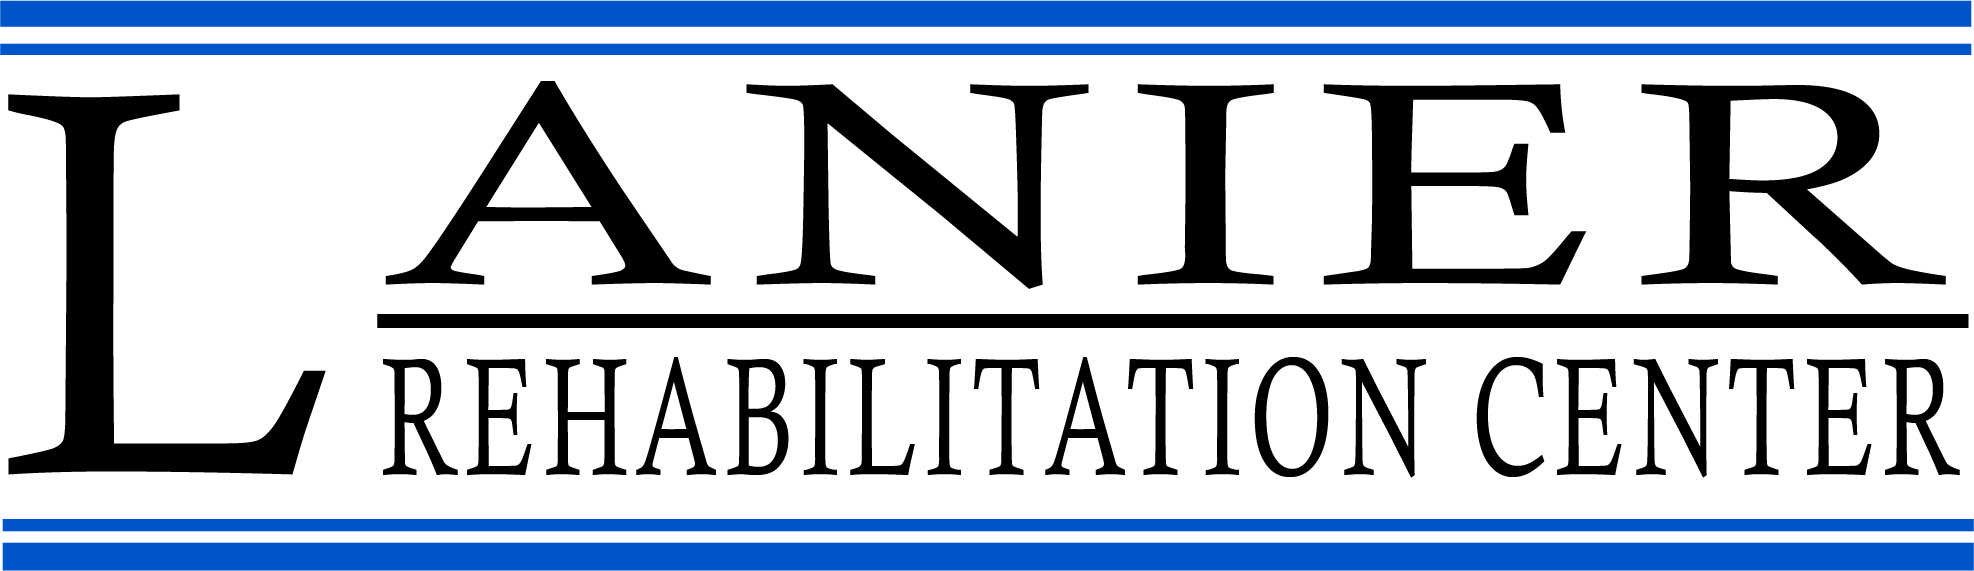 Lanier Rehabilitation Center logo